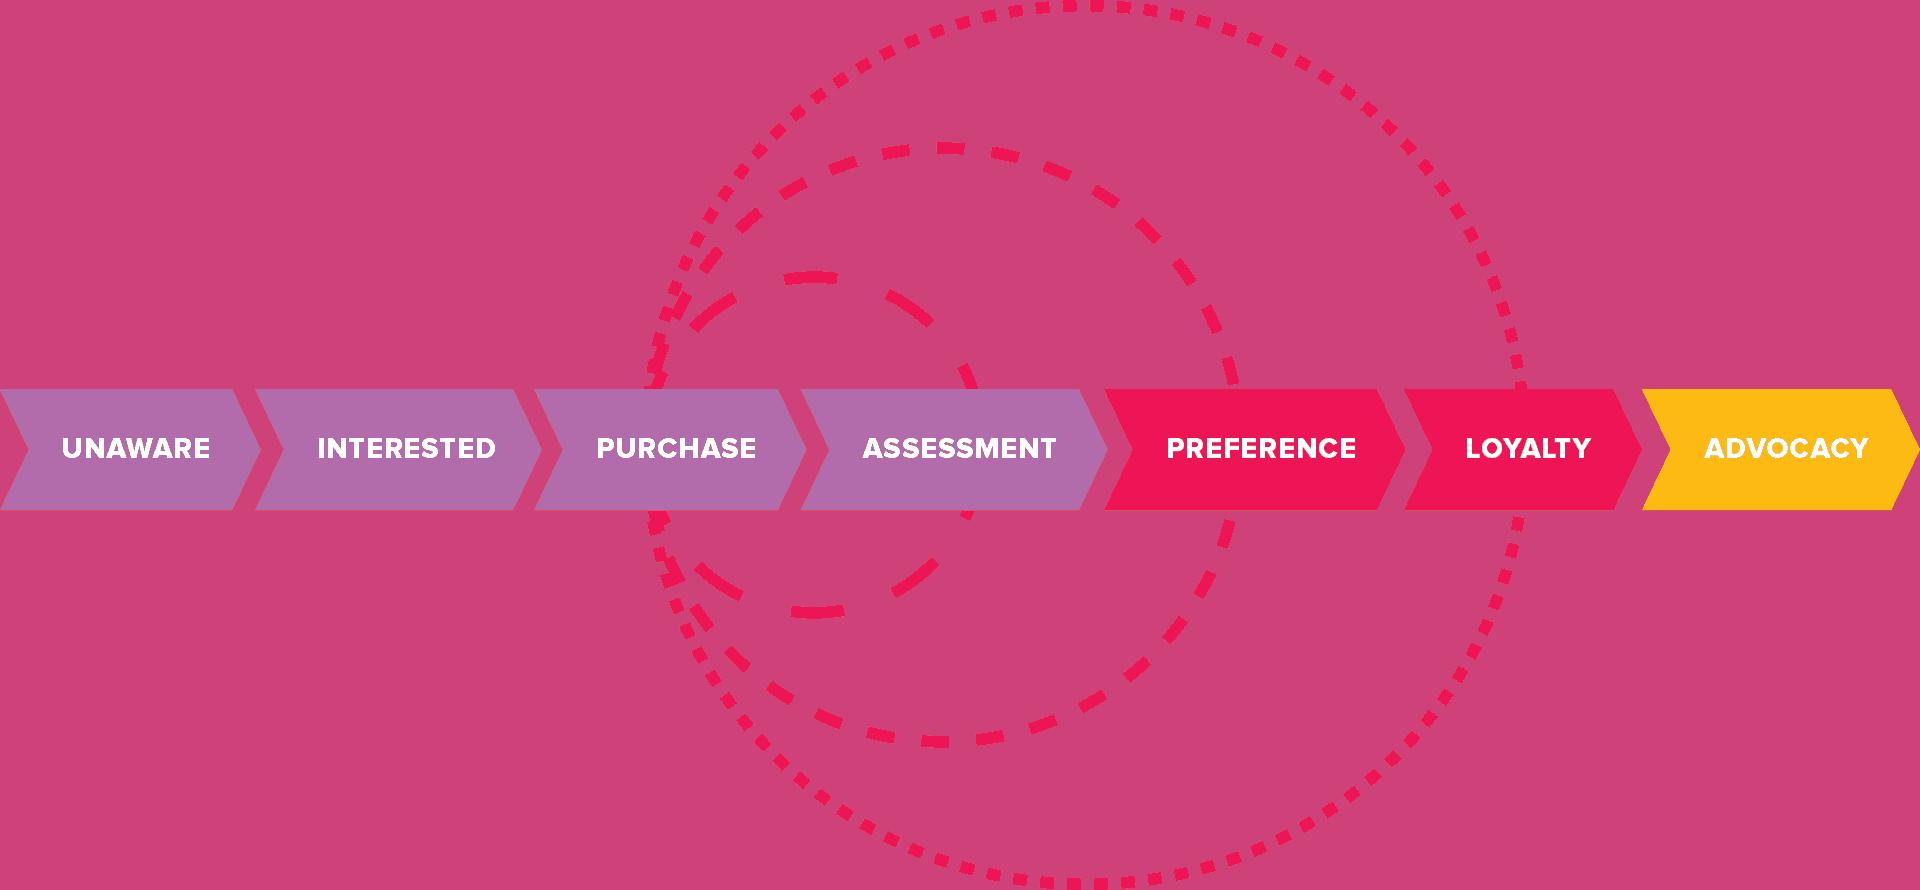 Consumer Journey for marketing and advertising restaurant brands